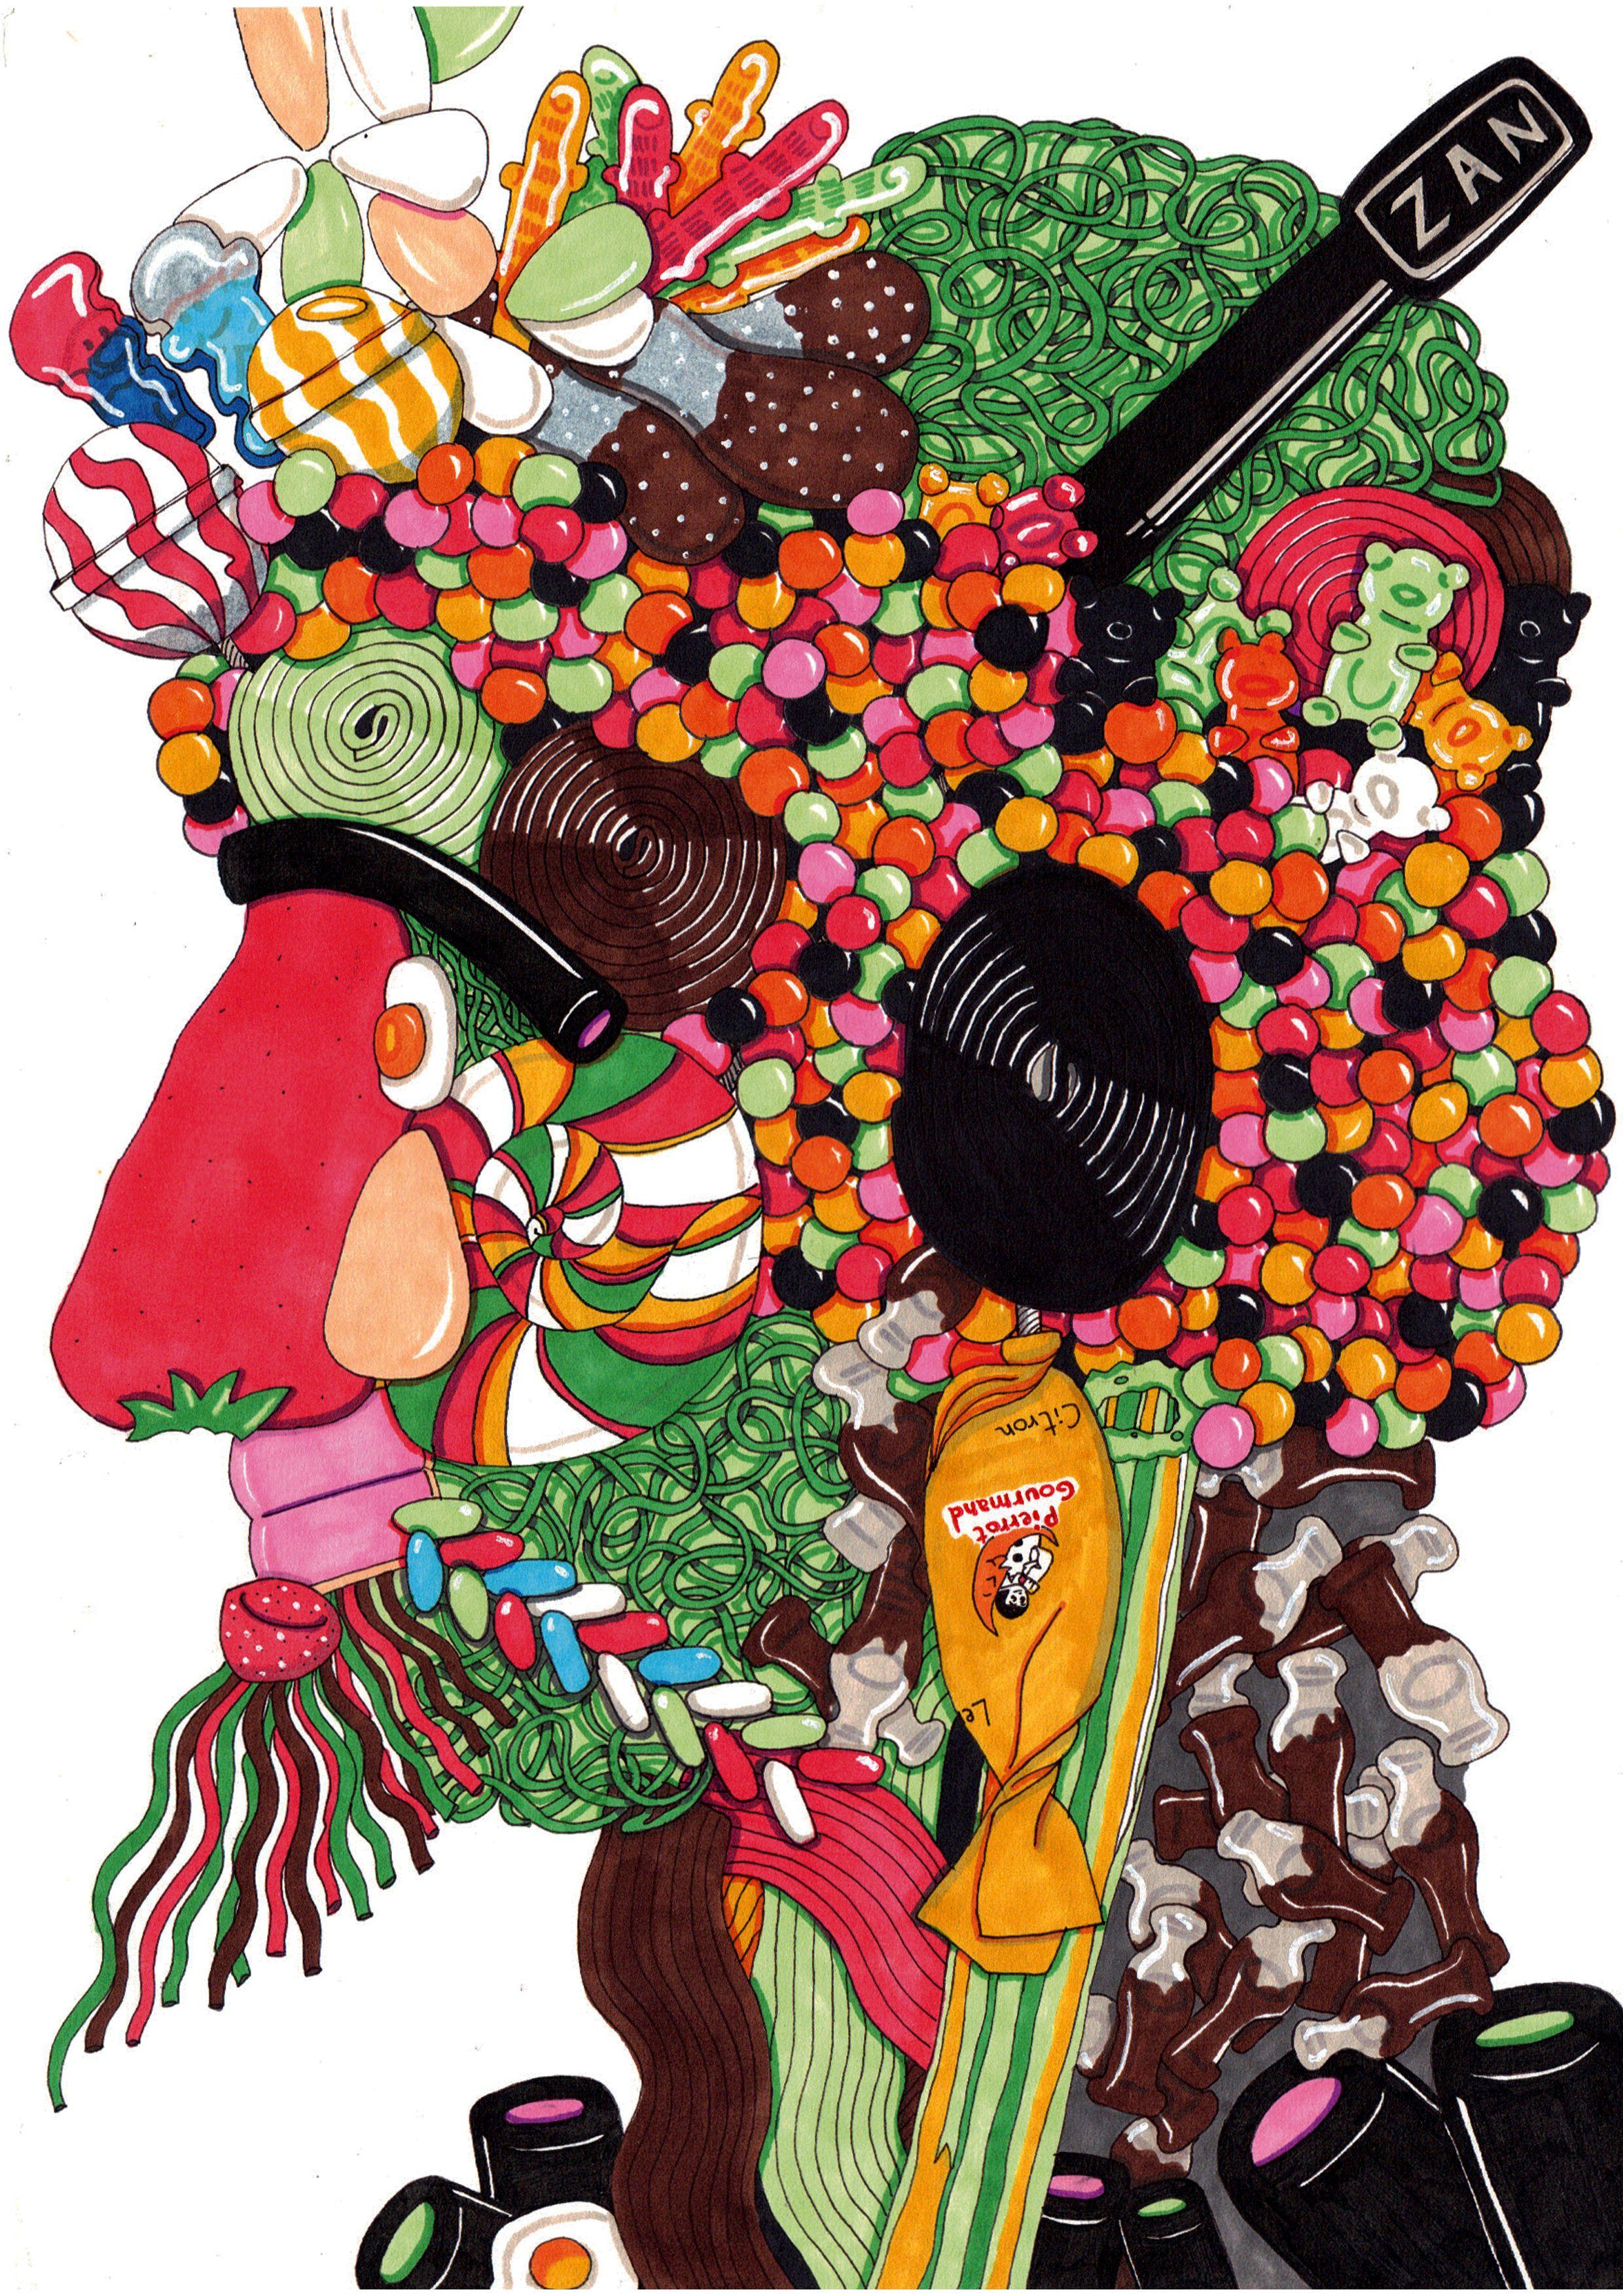 Arcimboldo dessin bonbons cr ation en 3e creationelle - Bonbon en dessin ...